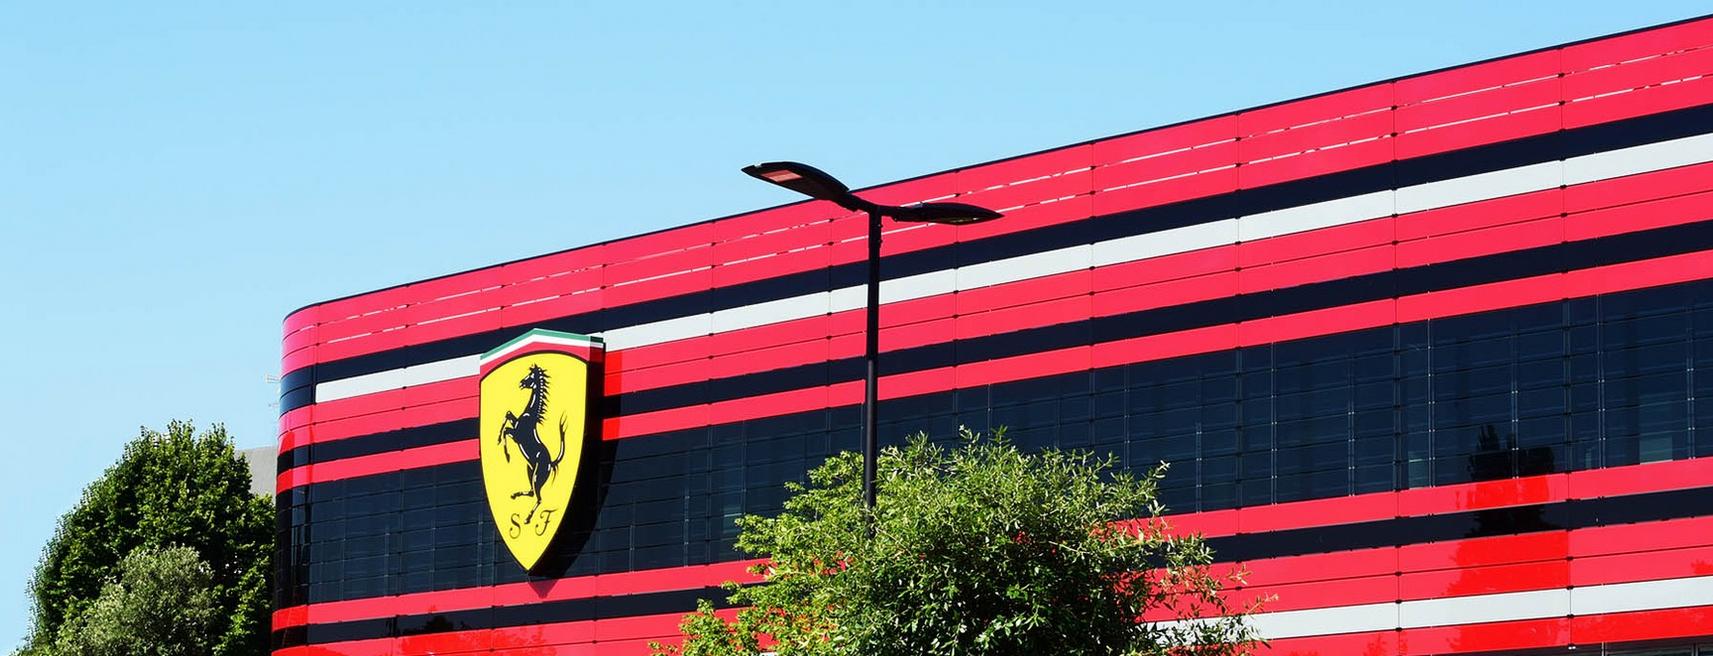 Italo-Ferrari